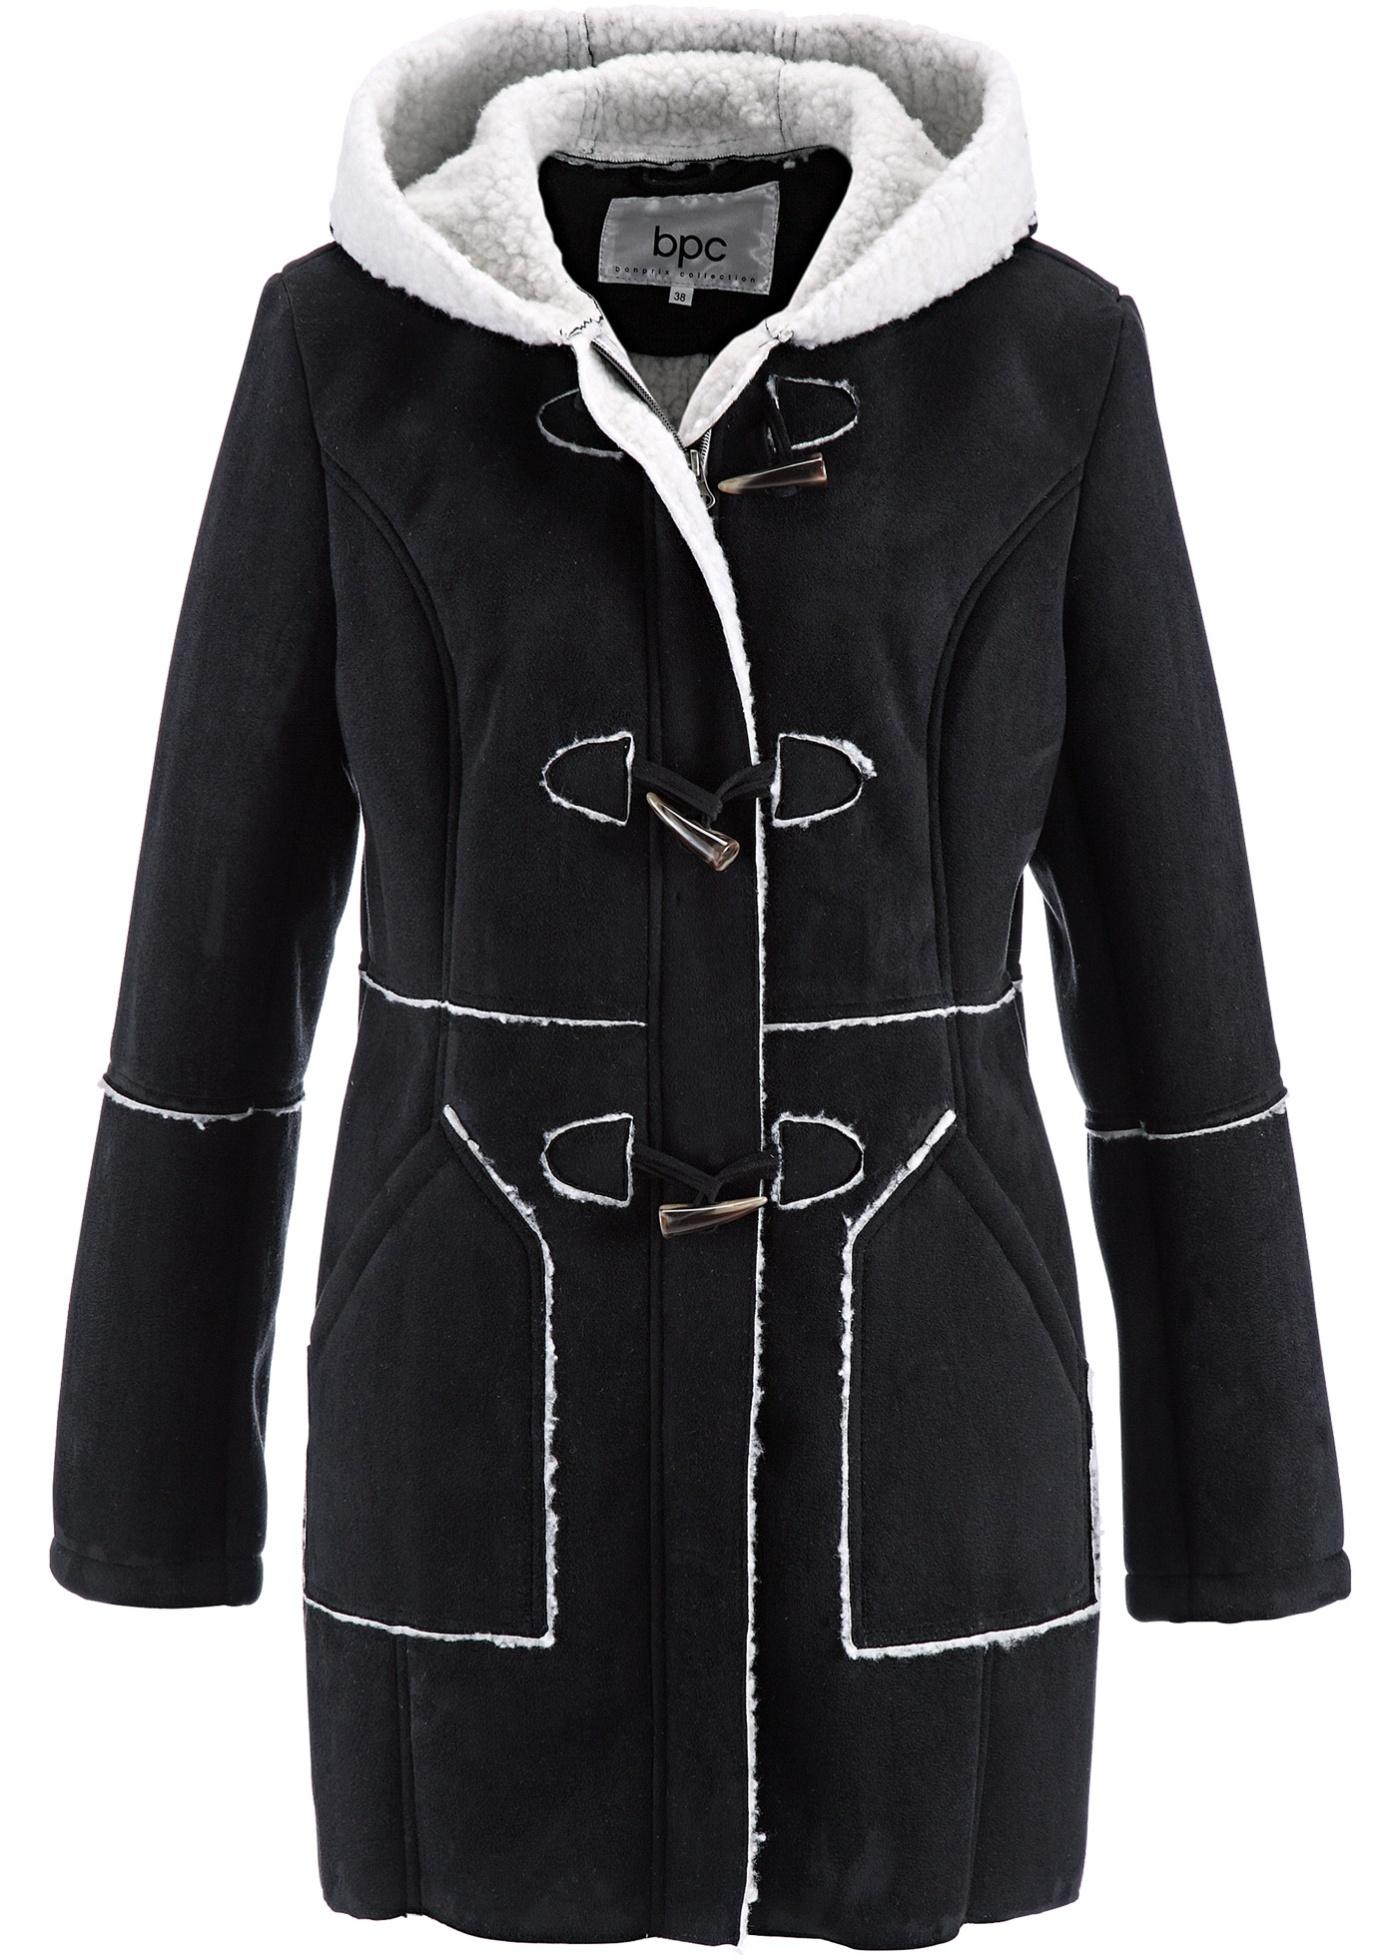 bpc bonprix collection Duffle-Coat langarm  in schwarz für Damen von bonprix